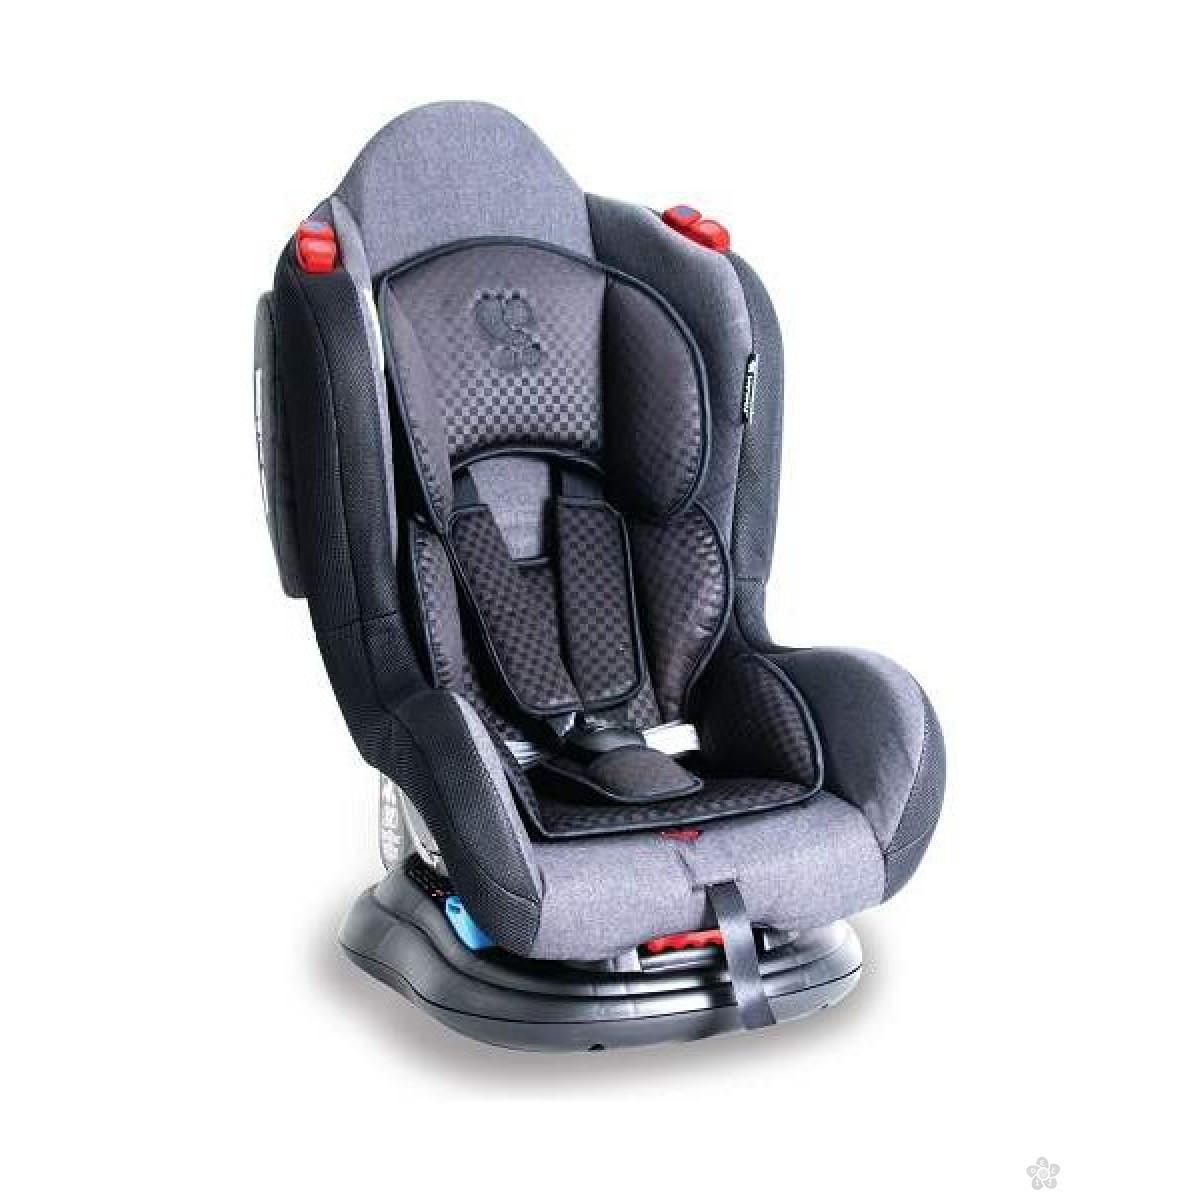 Auto Sedište Jupiter Black 0-25kg 10070941755